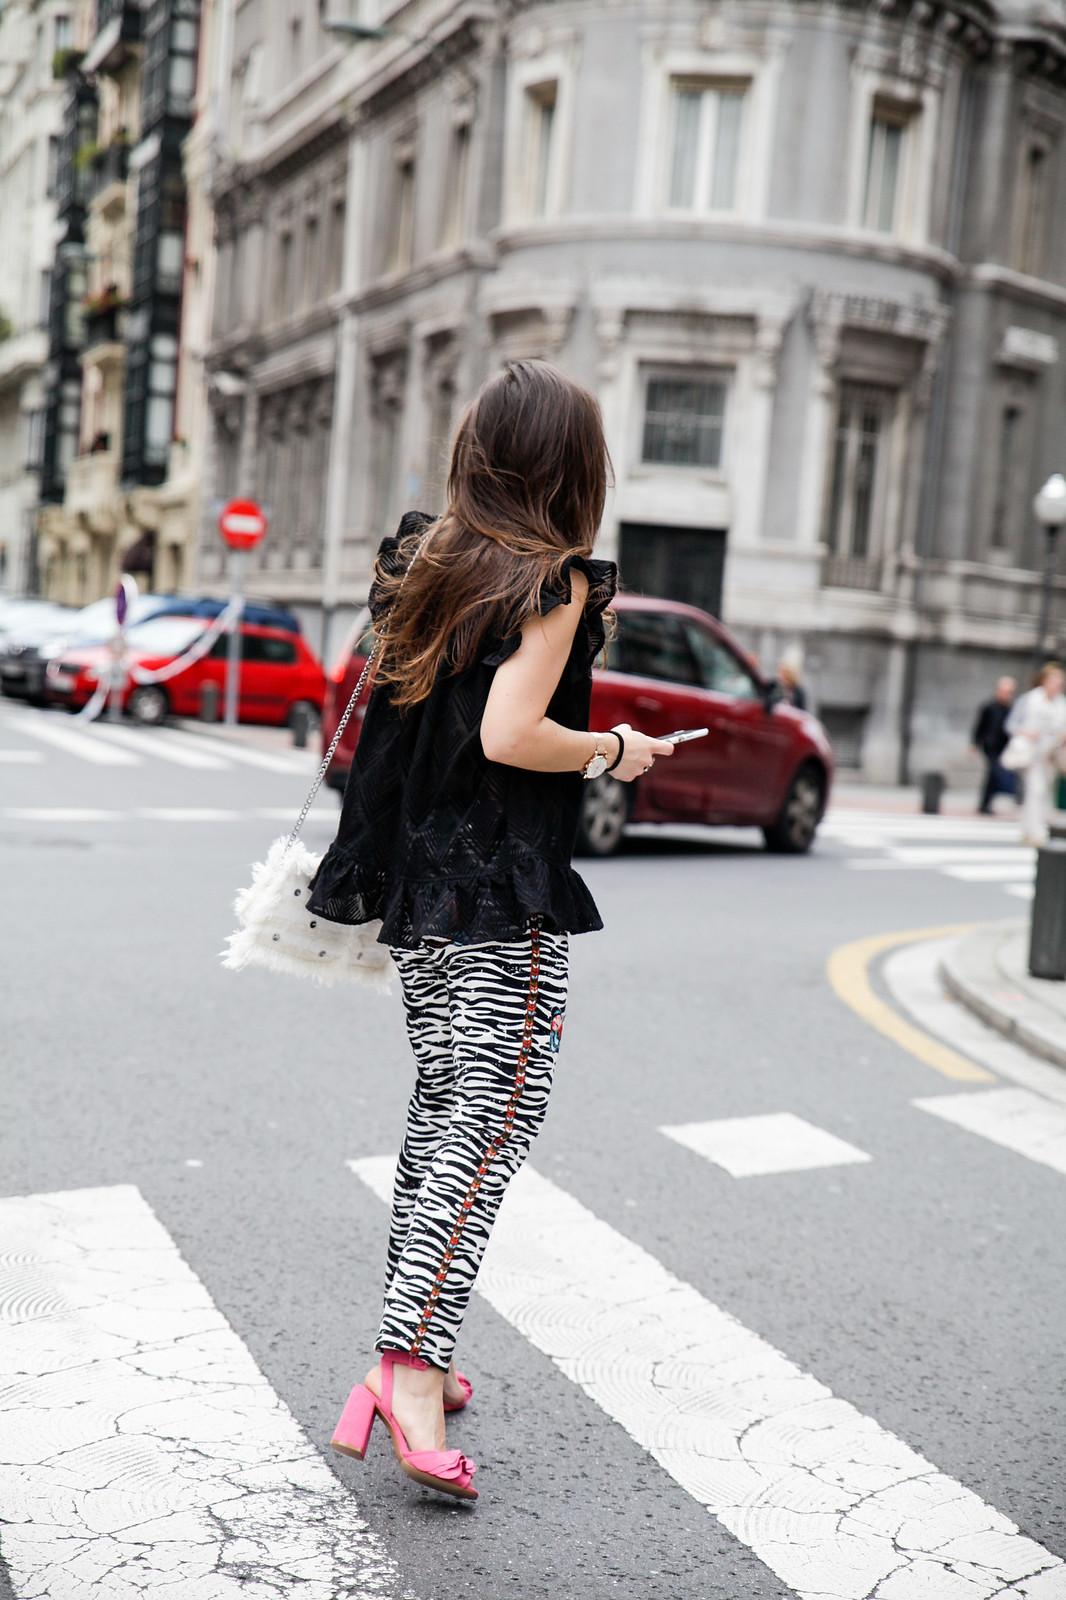 08_Pantalones_Zebra_Blusa_Boho_tacones_rosas_stradivarius_Theguestgirl_outfit_barcelona_streetstyle